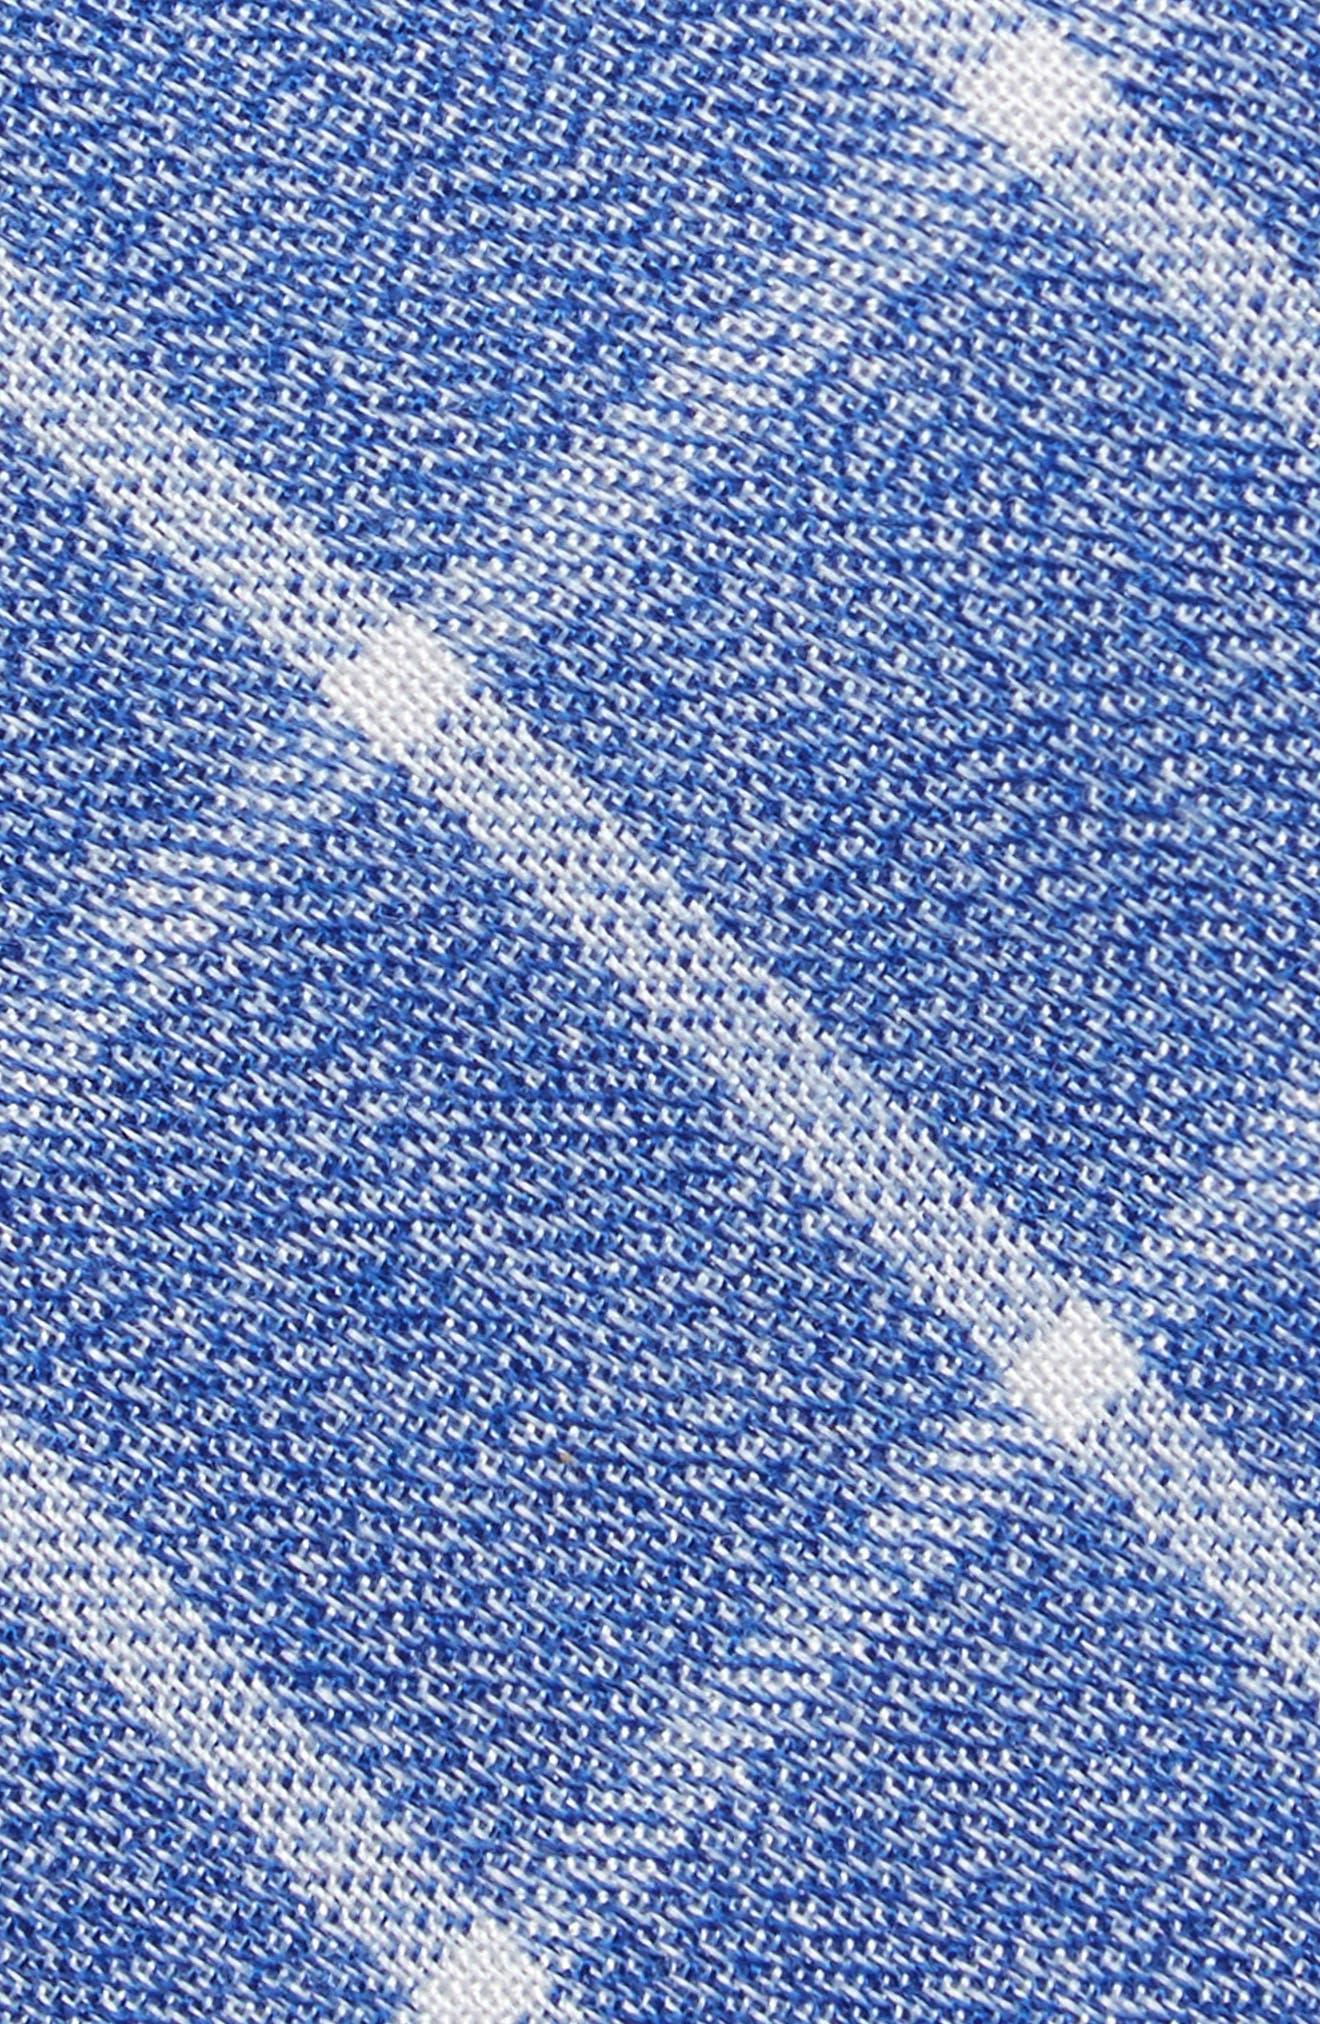 Alternate Image 2  - Nordstrom Men's Shop Wilbur Check Cotton Tie